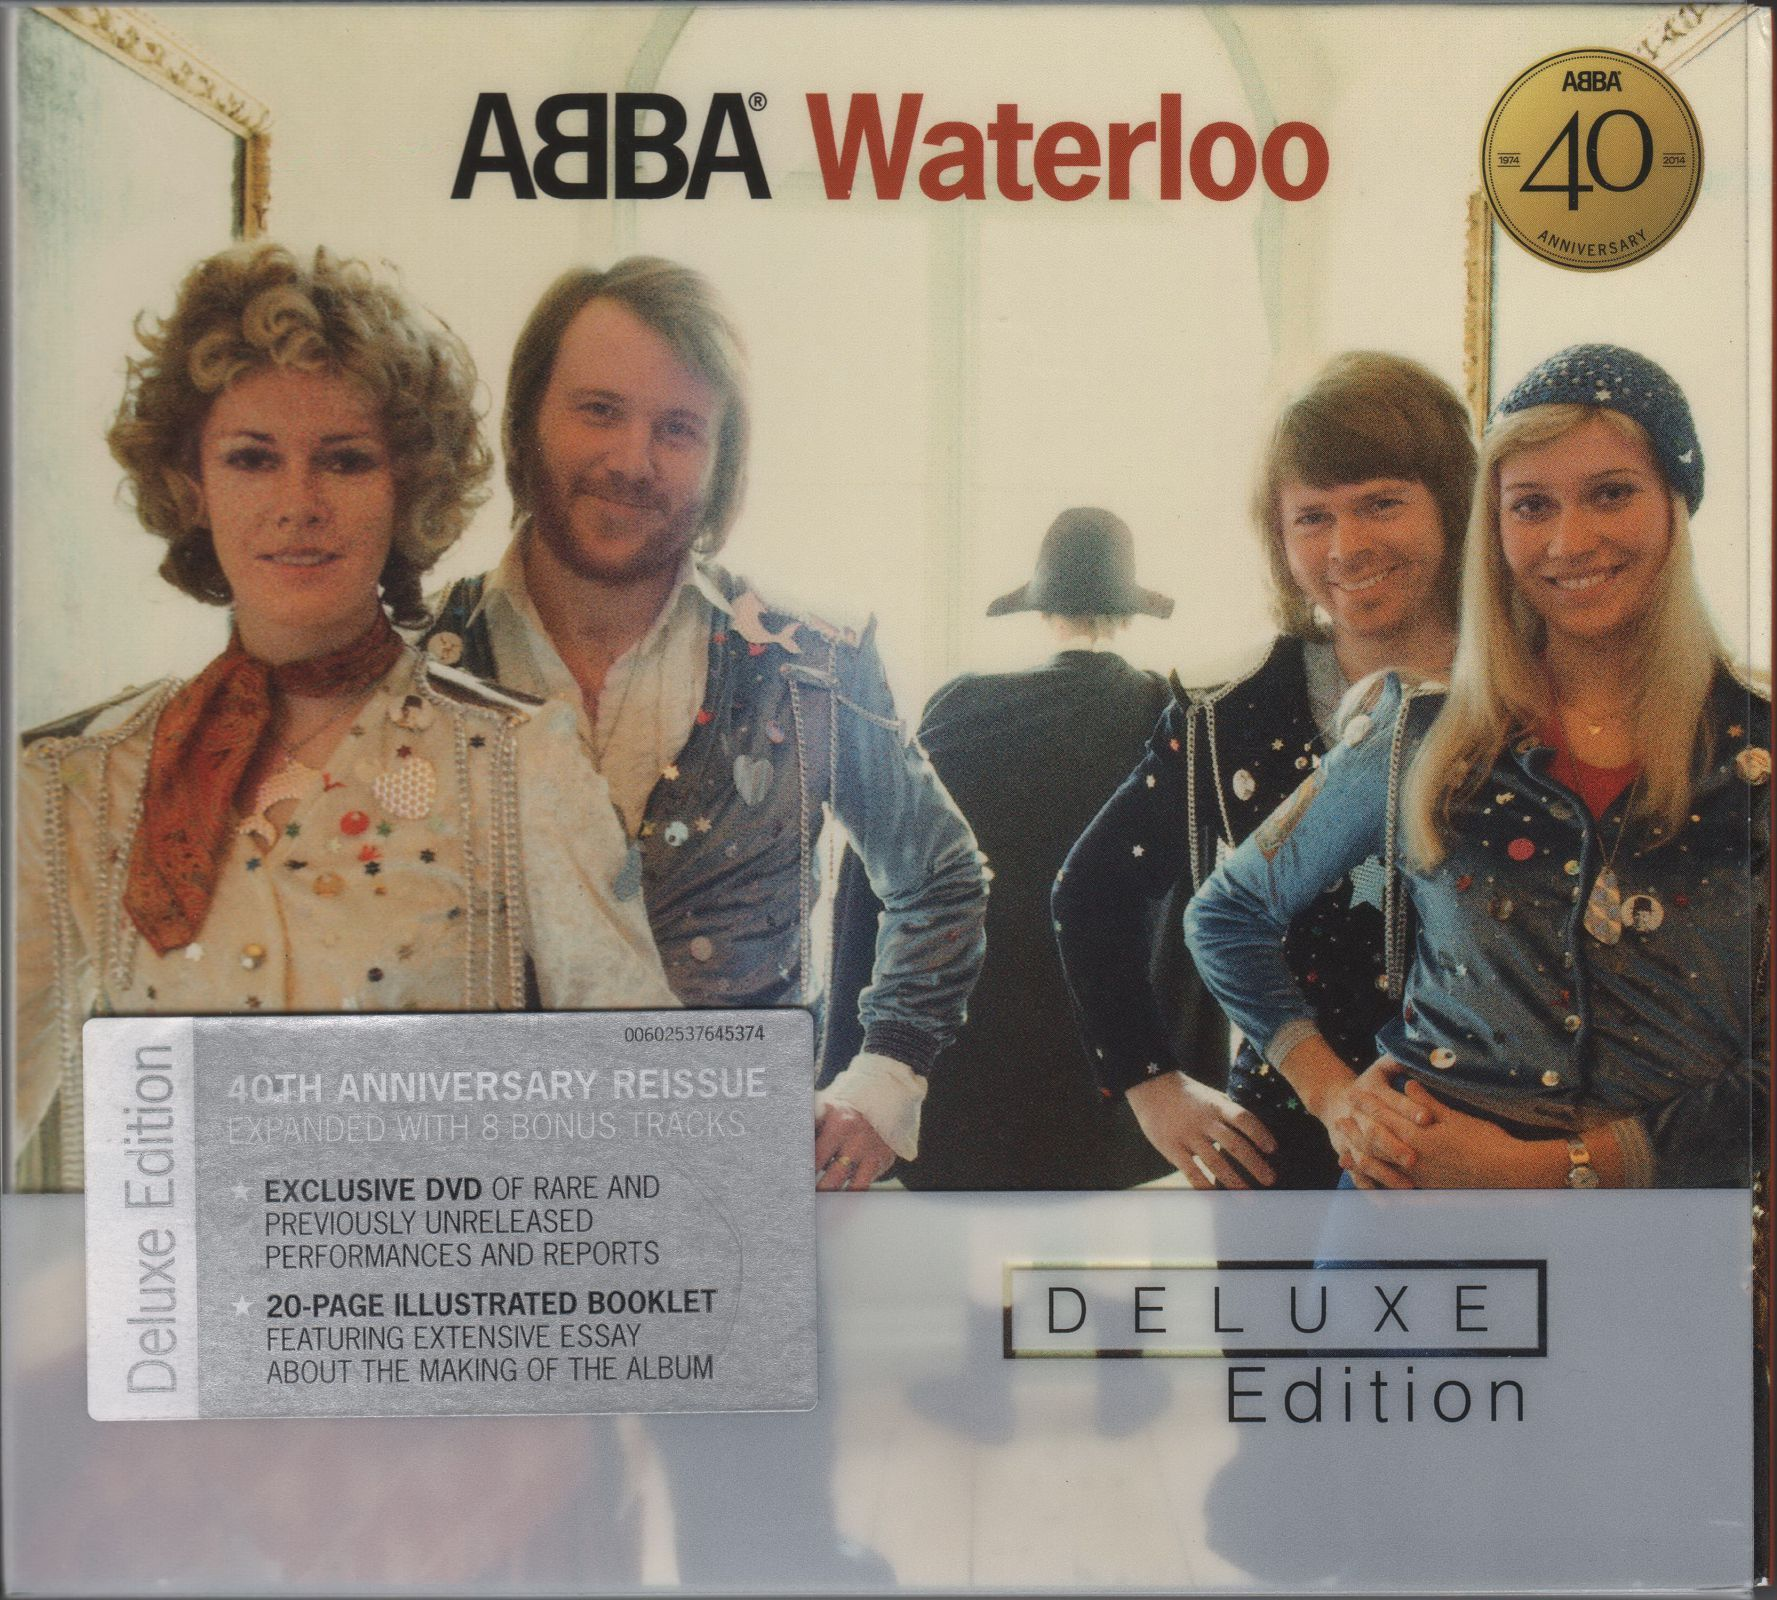 ABBA - Waterloo (deluxe edition) album cover